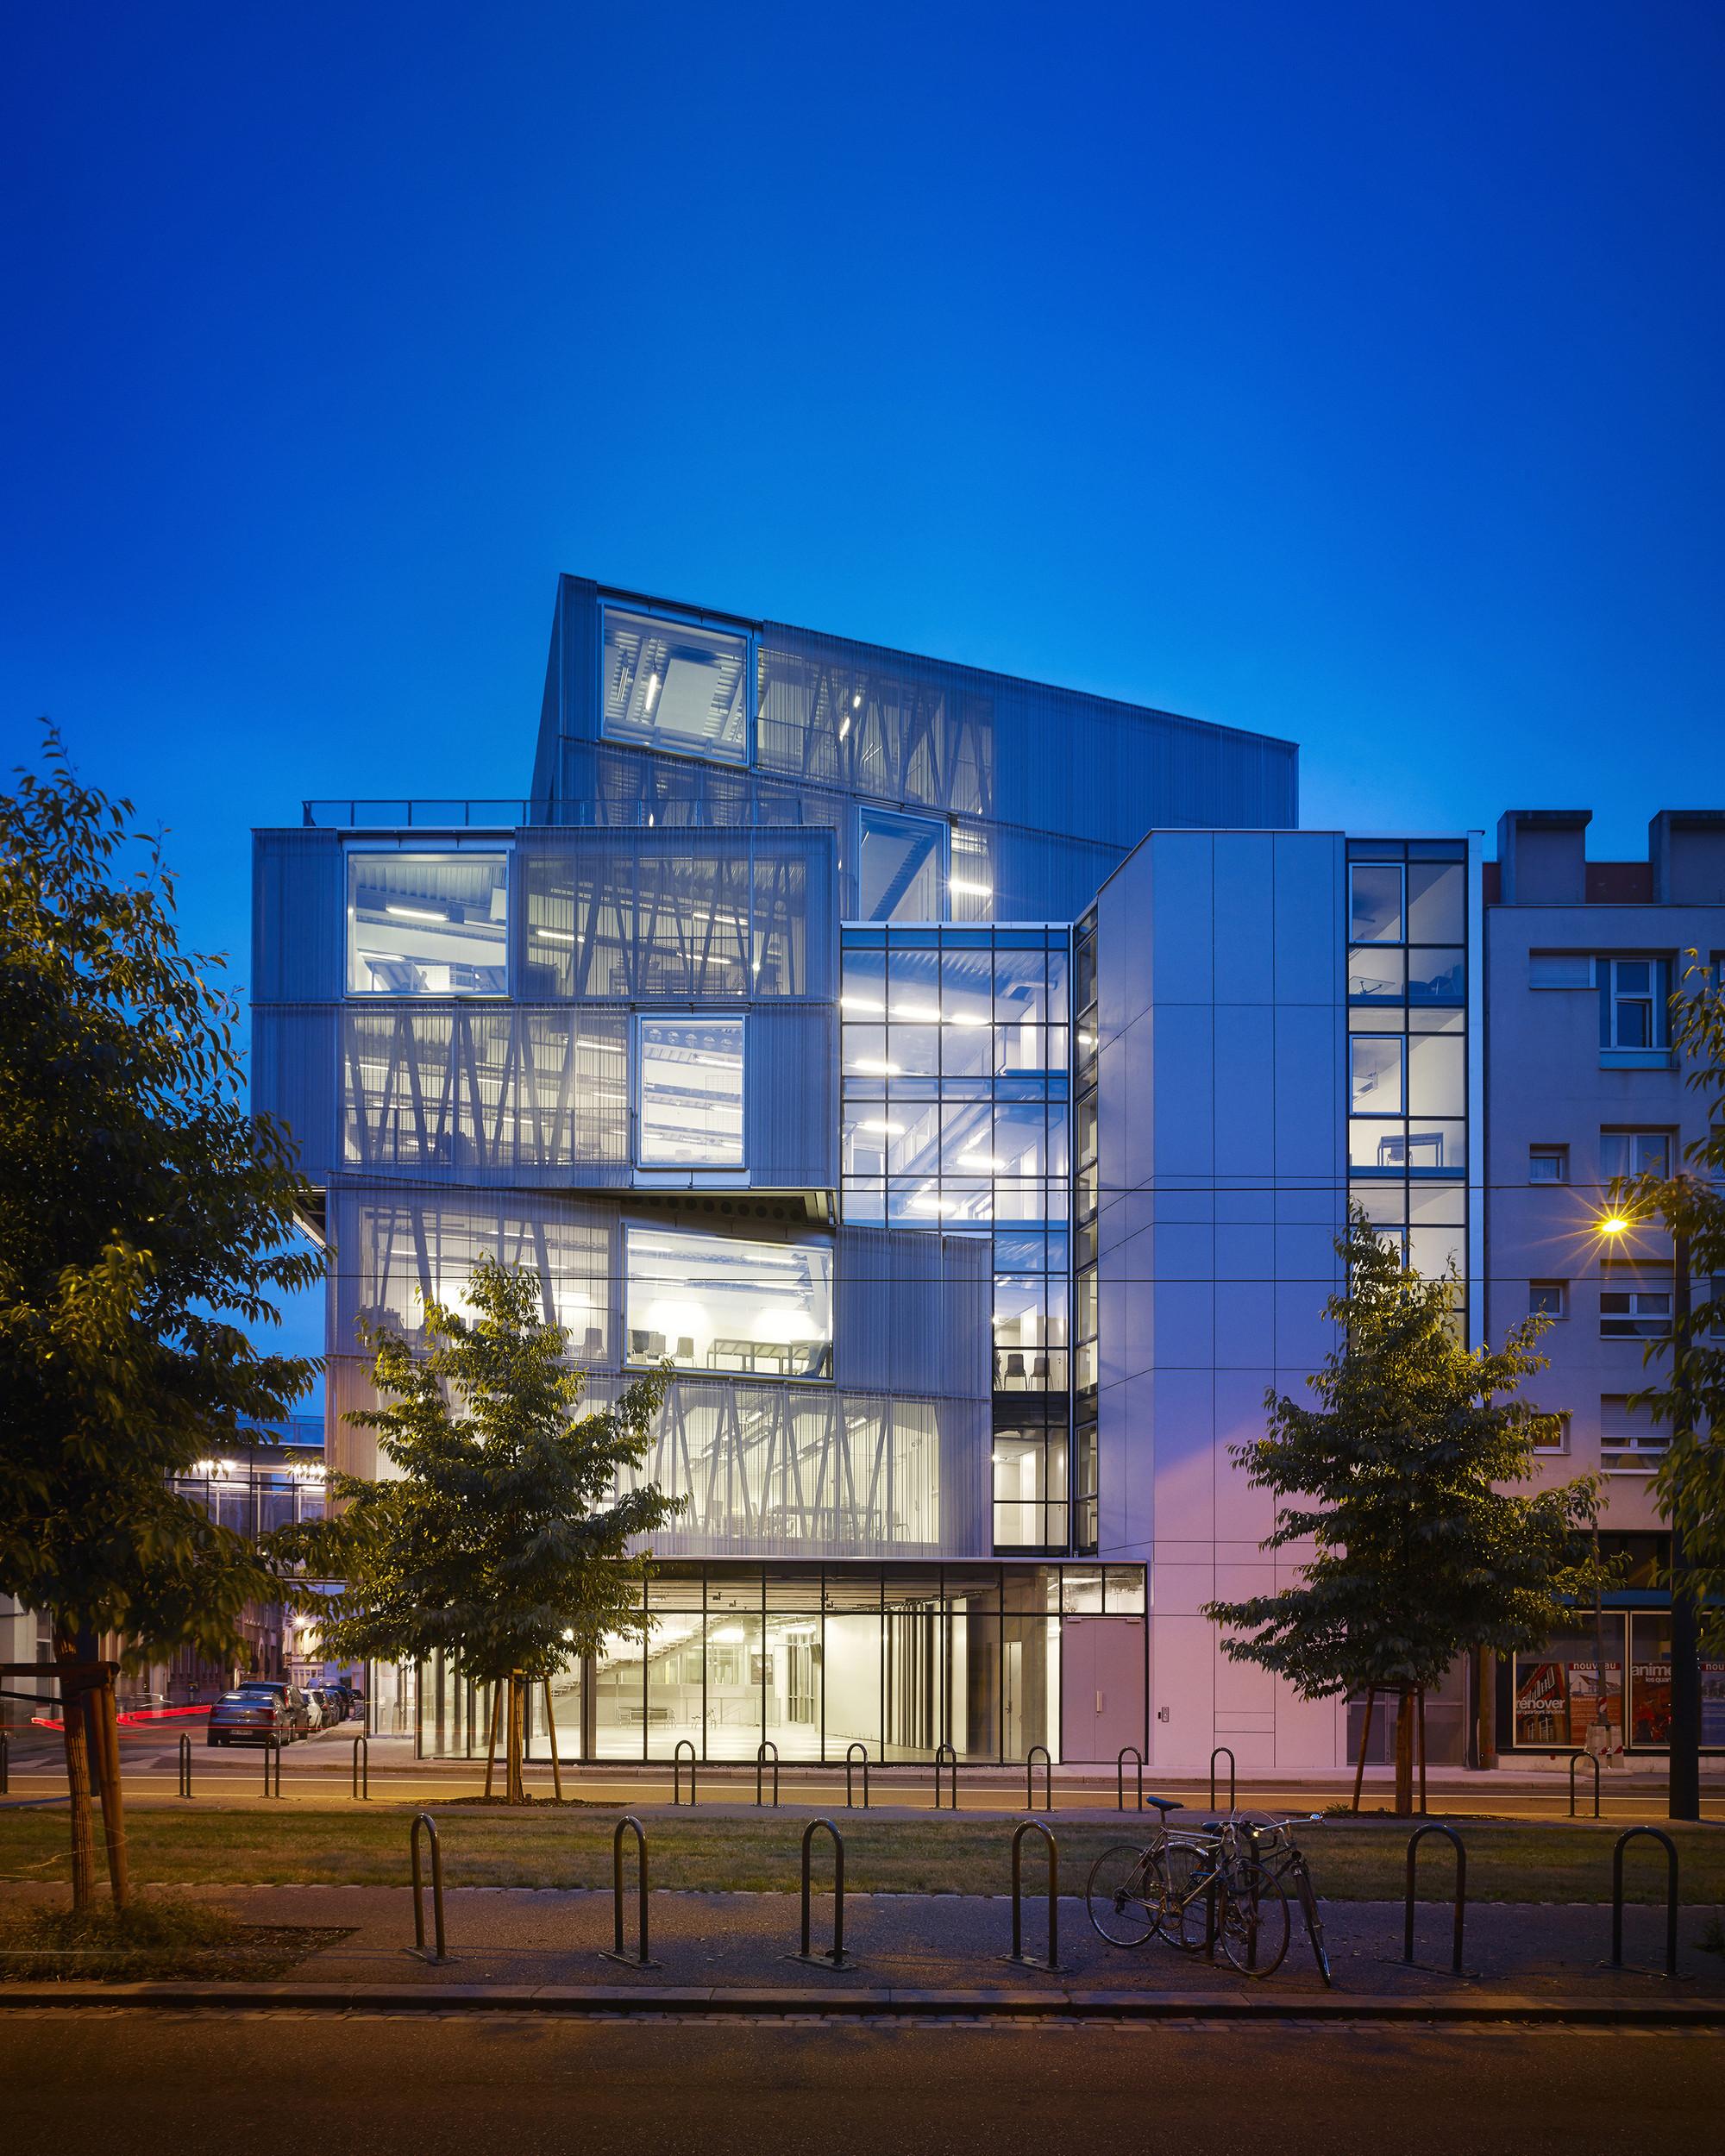 Galeria de escola de arquitetura de strasbourg marc for J j school of architecture